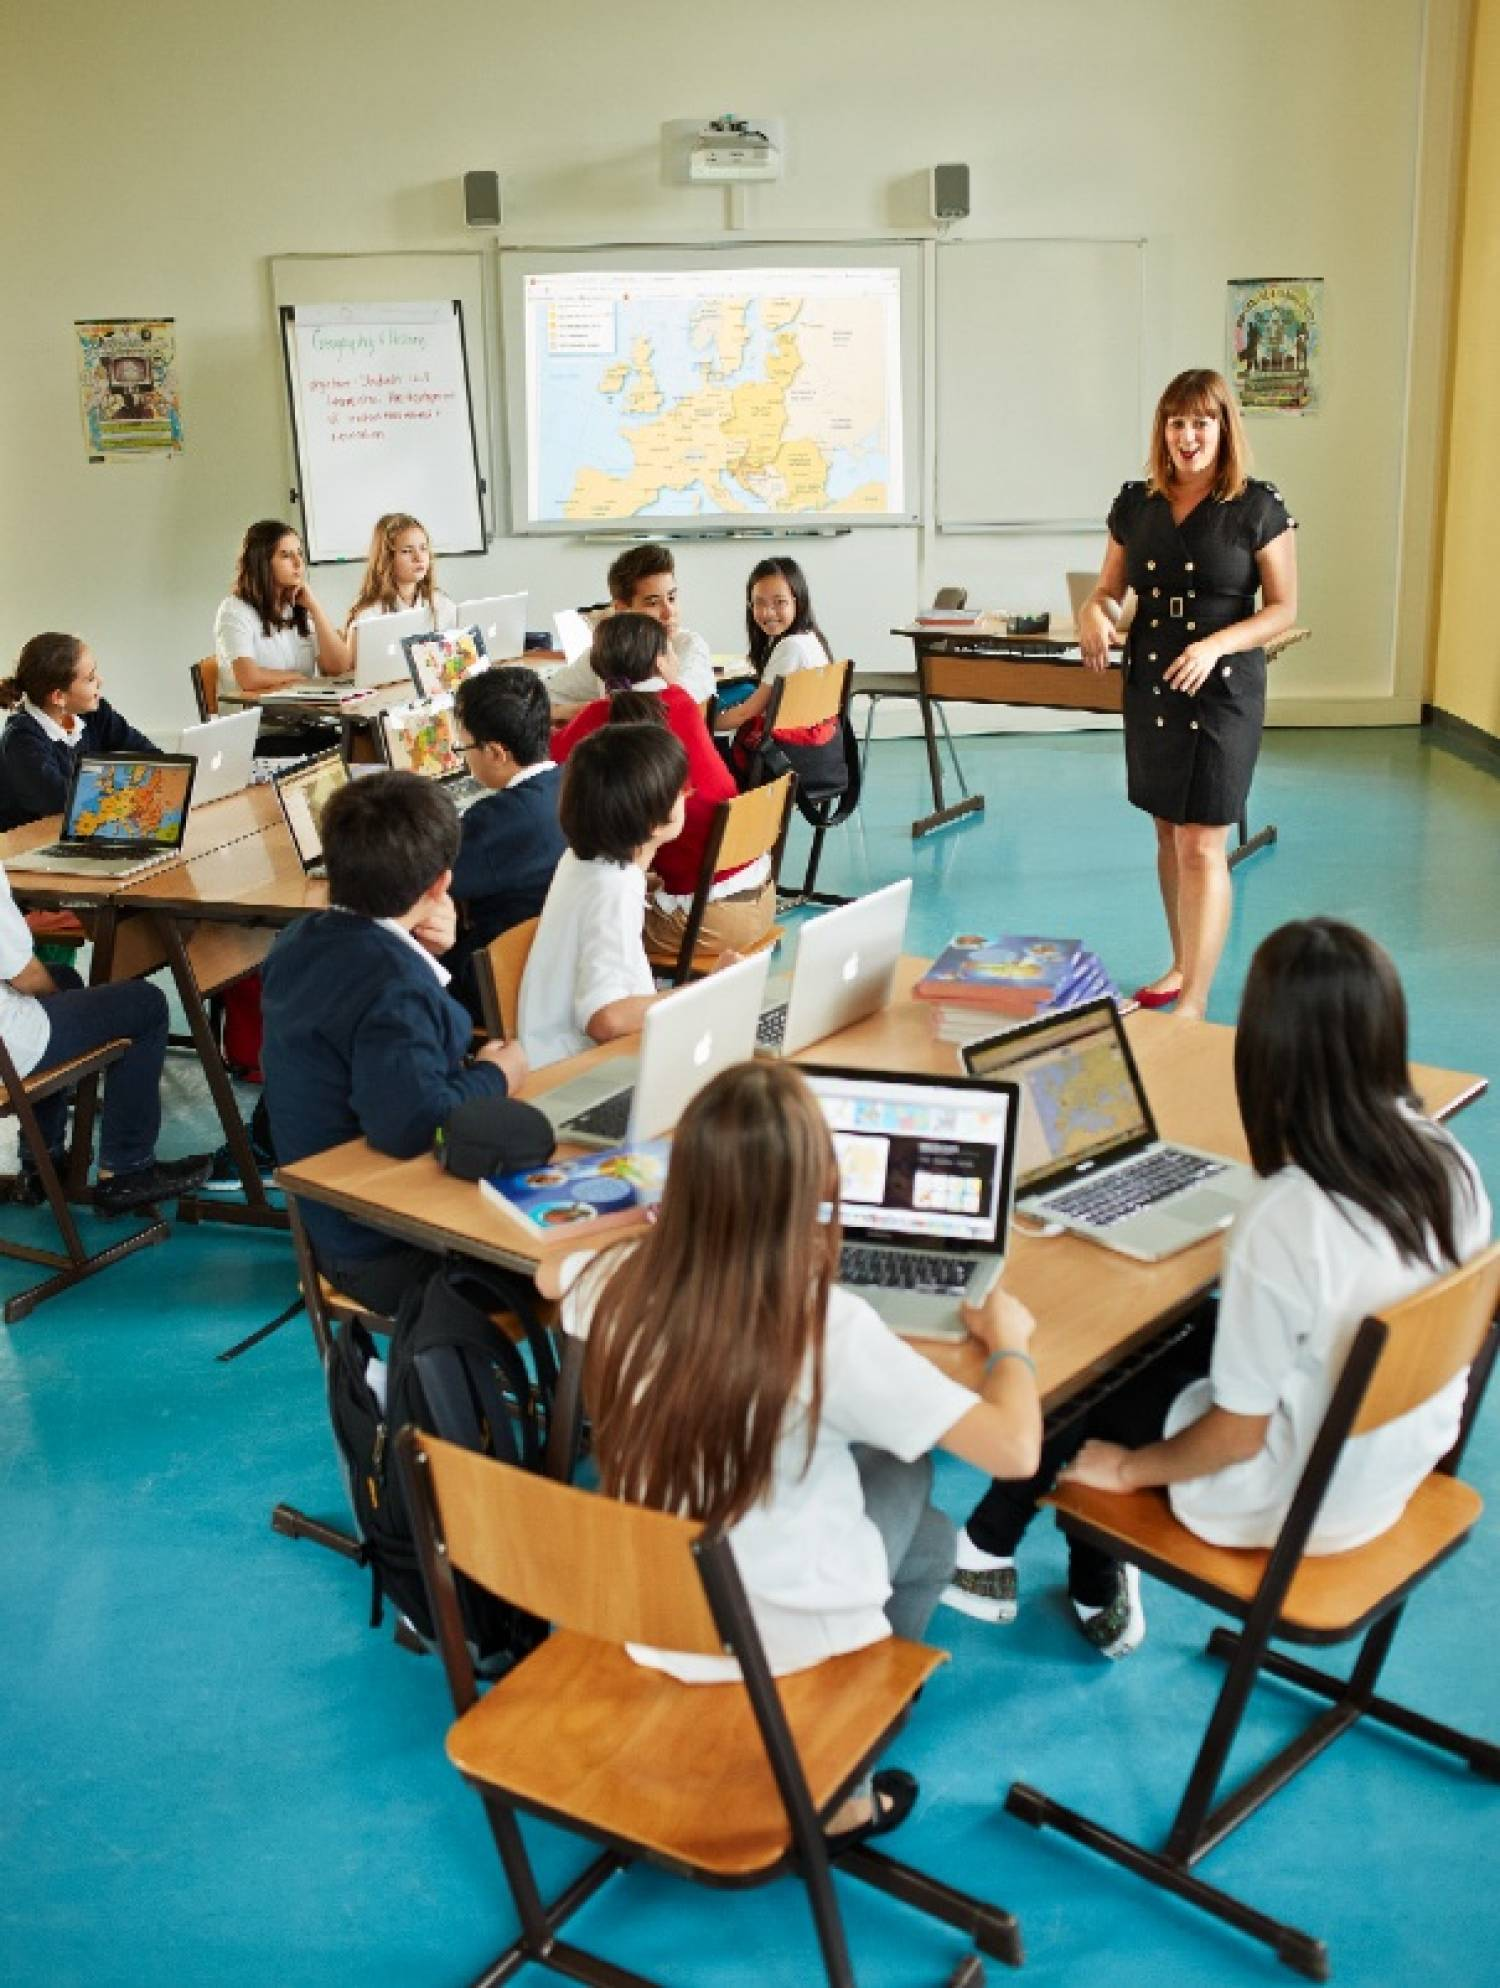 Cистема образования в австрии